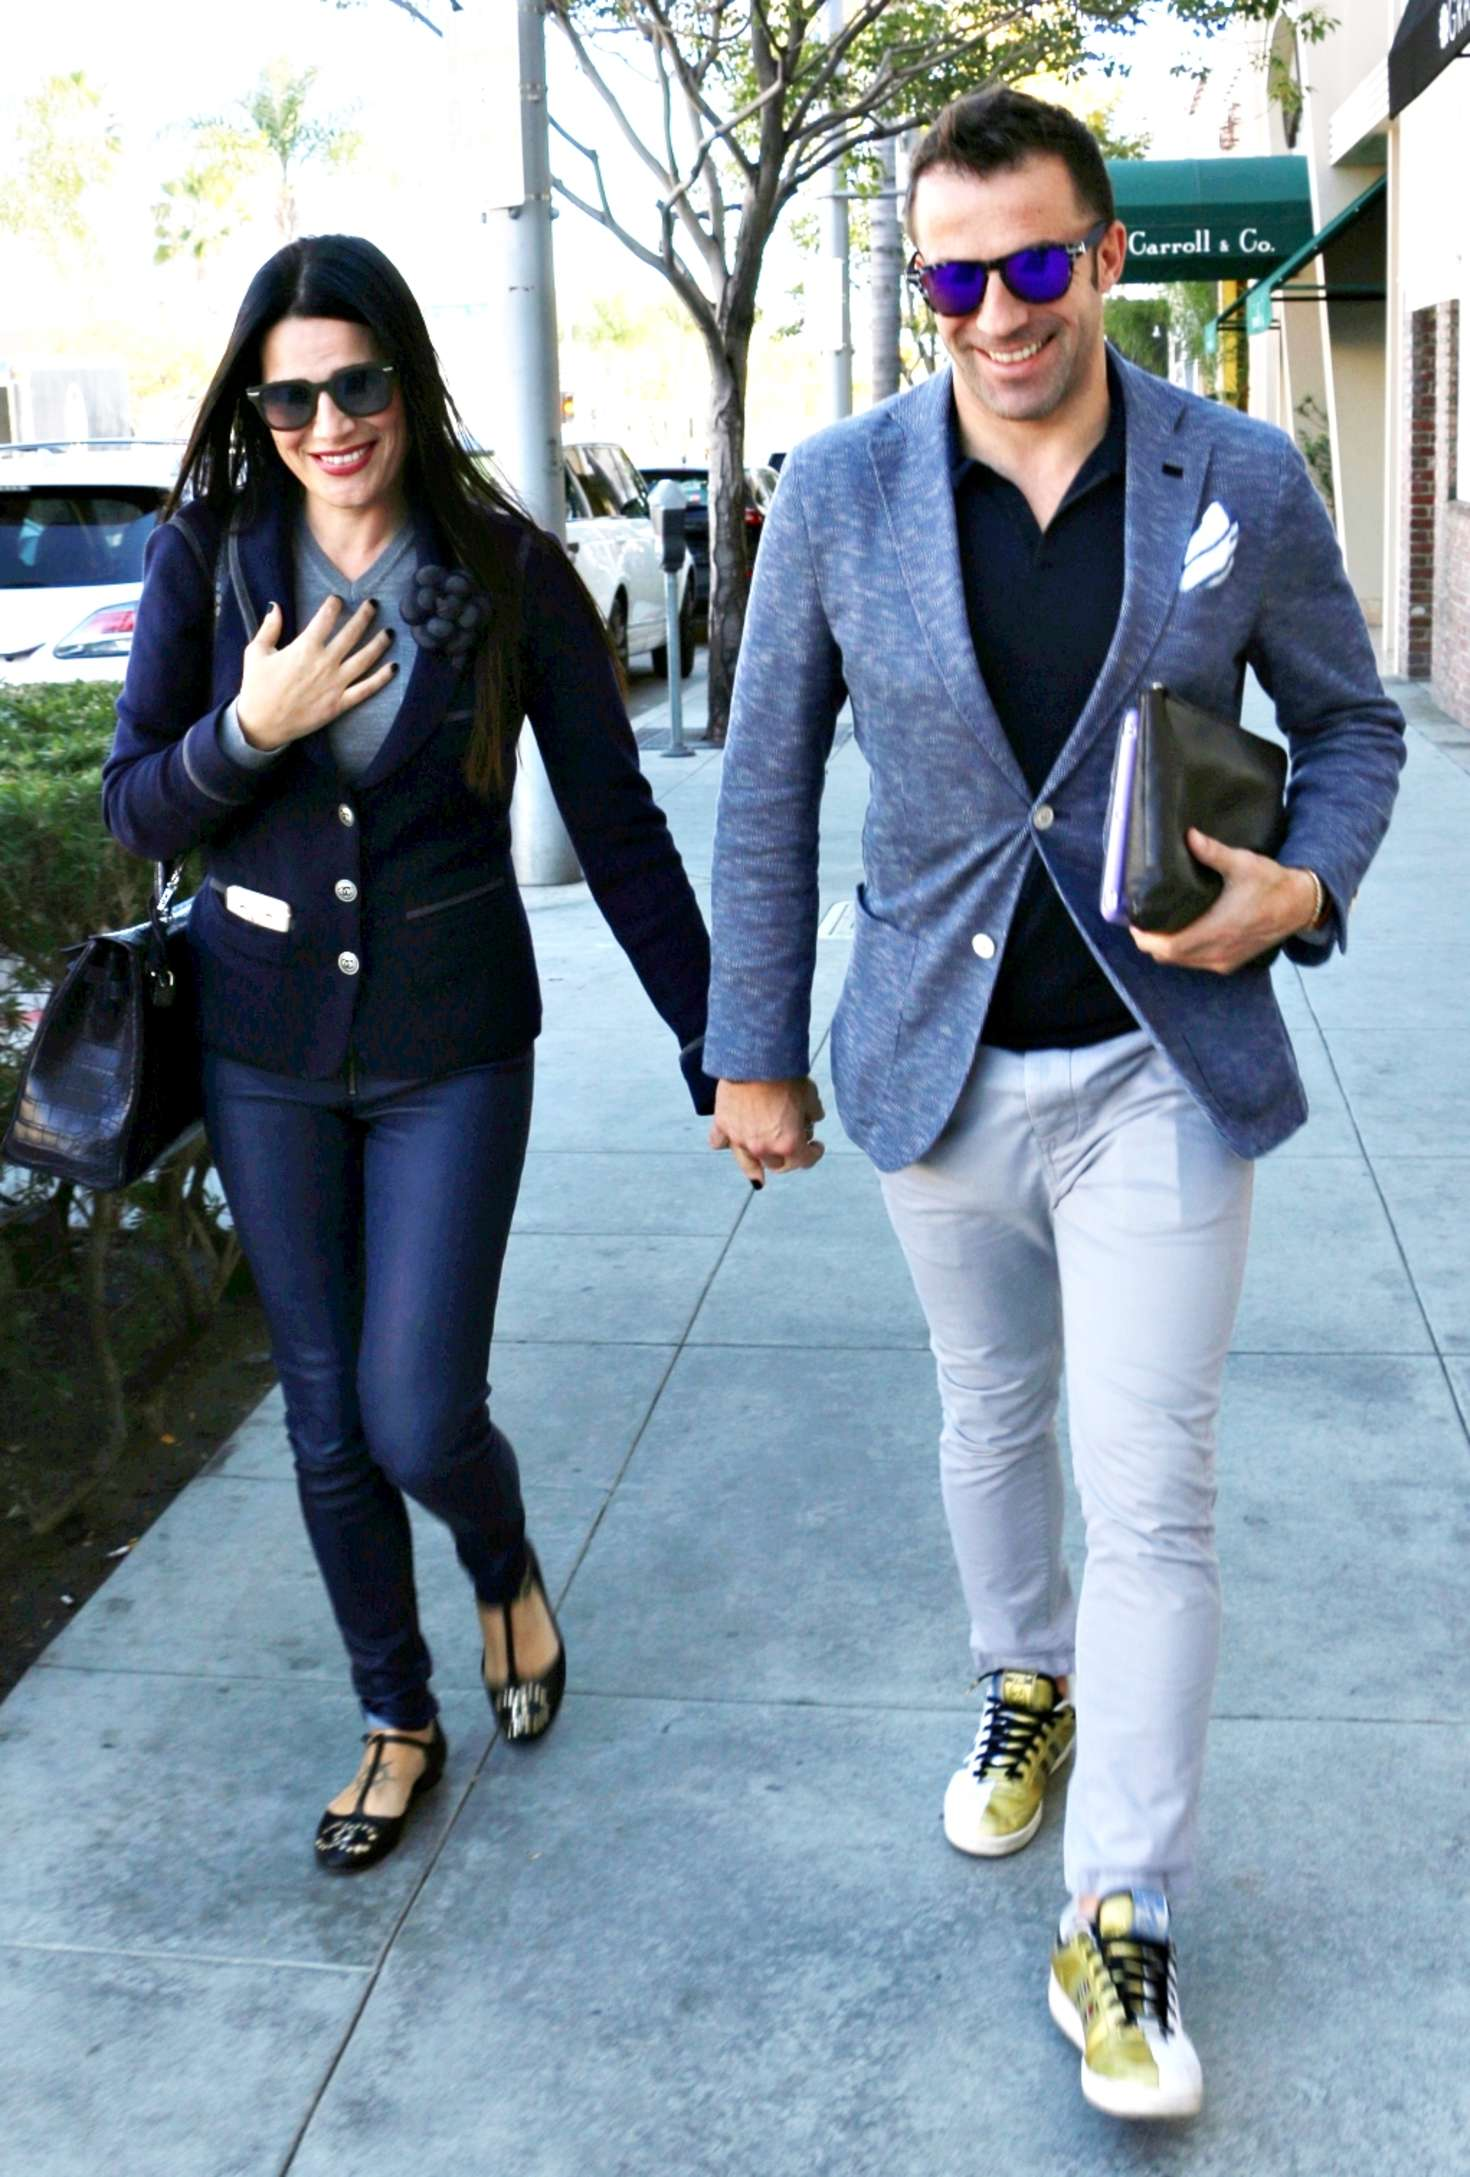 Sonia amoruso with husband alessandro del piero out in los for Alessandro del piero sonia amoruso